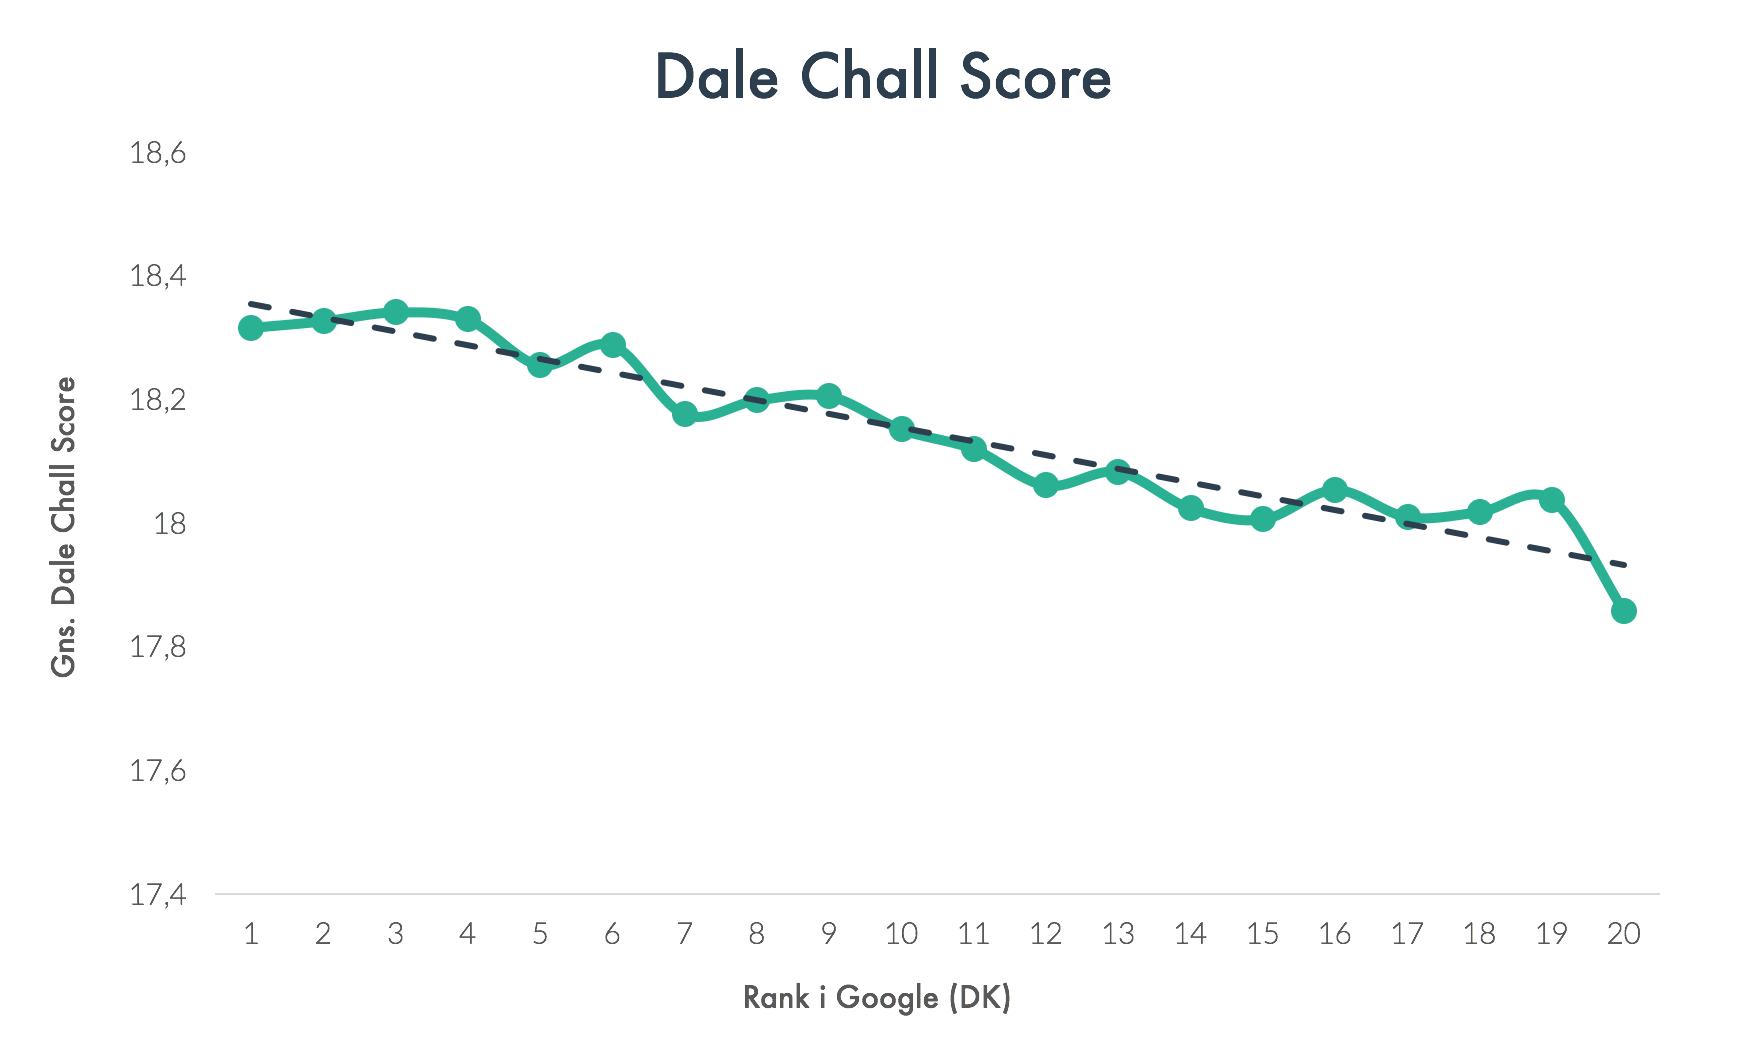 Dale Chall Score